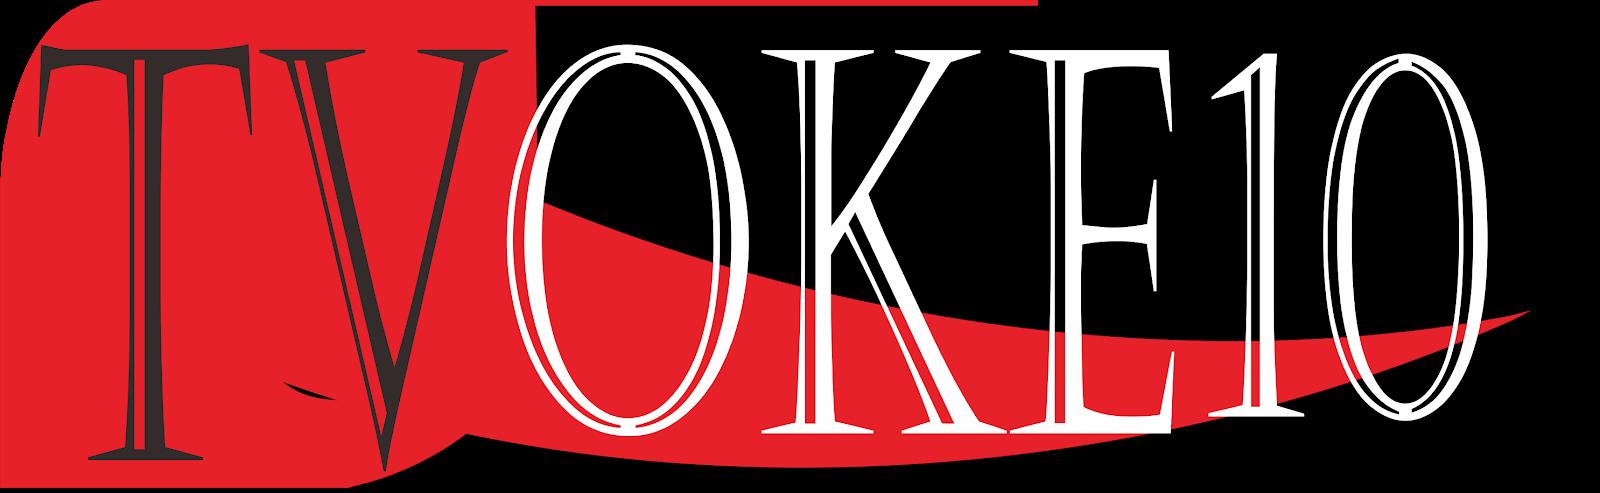 TVoke10